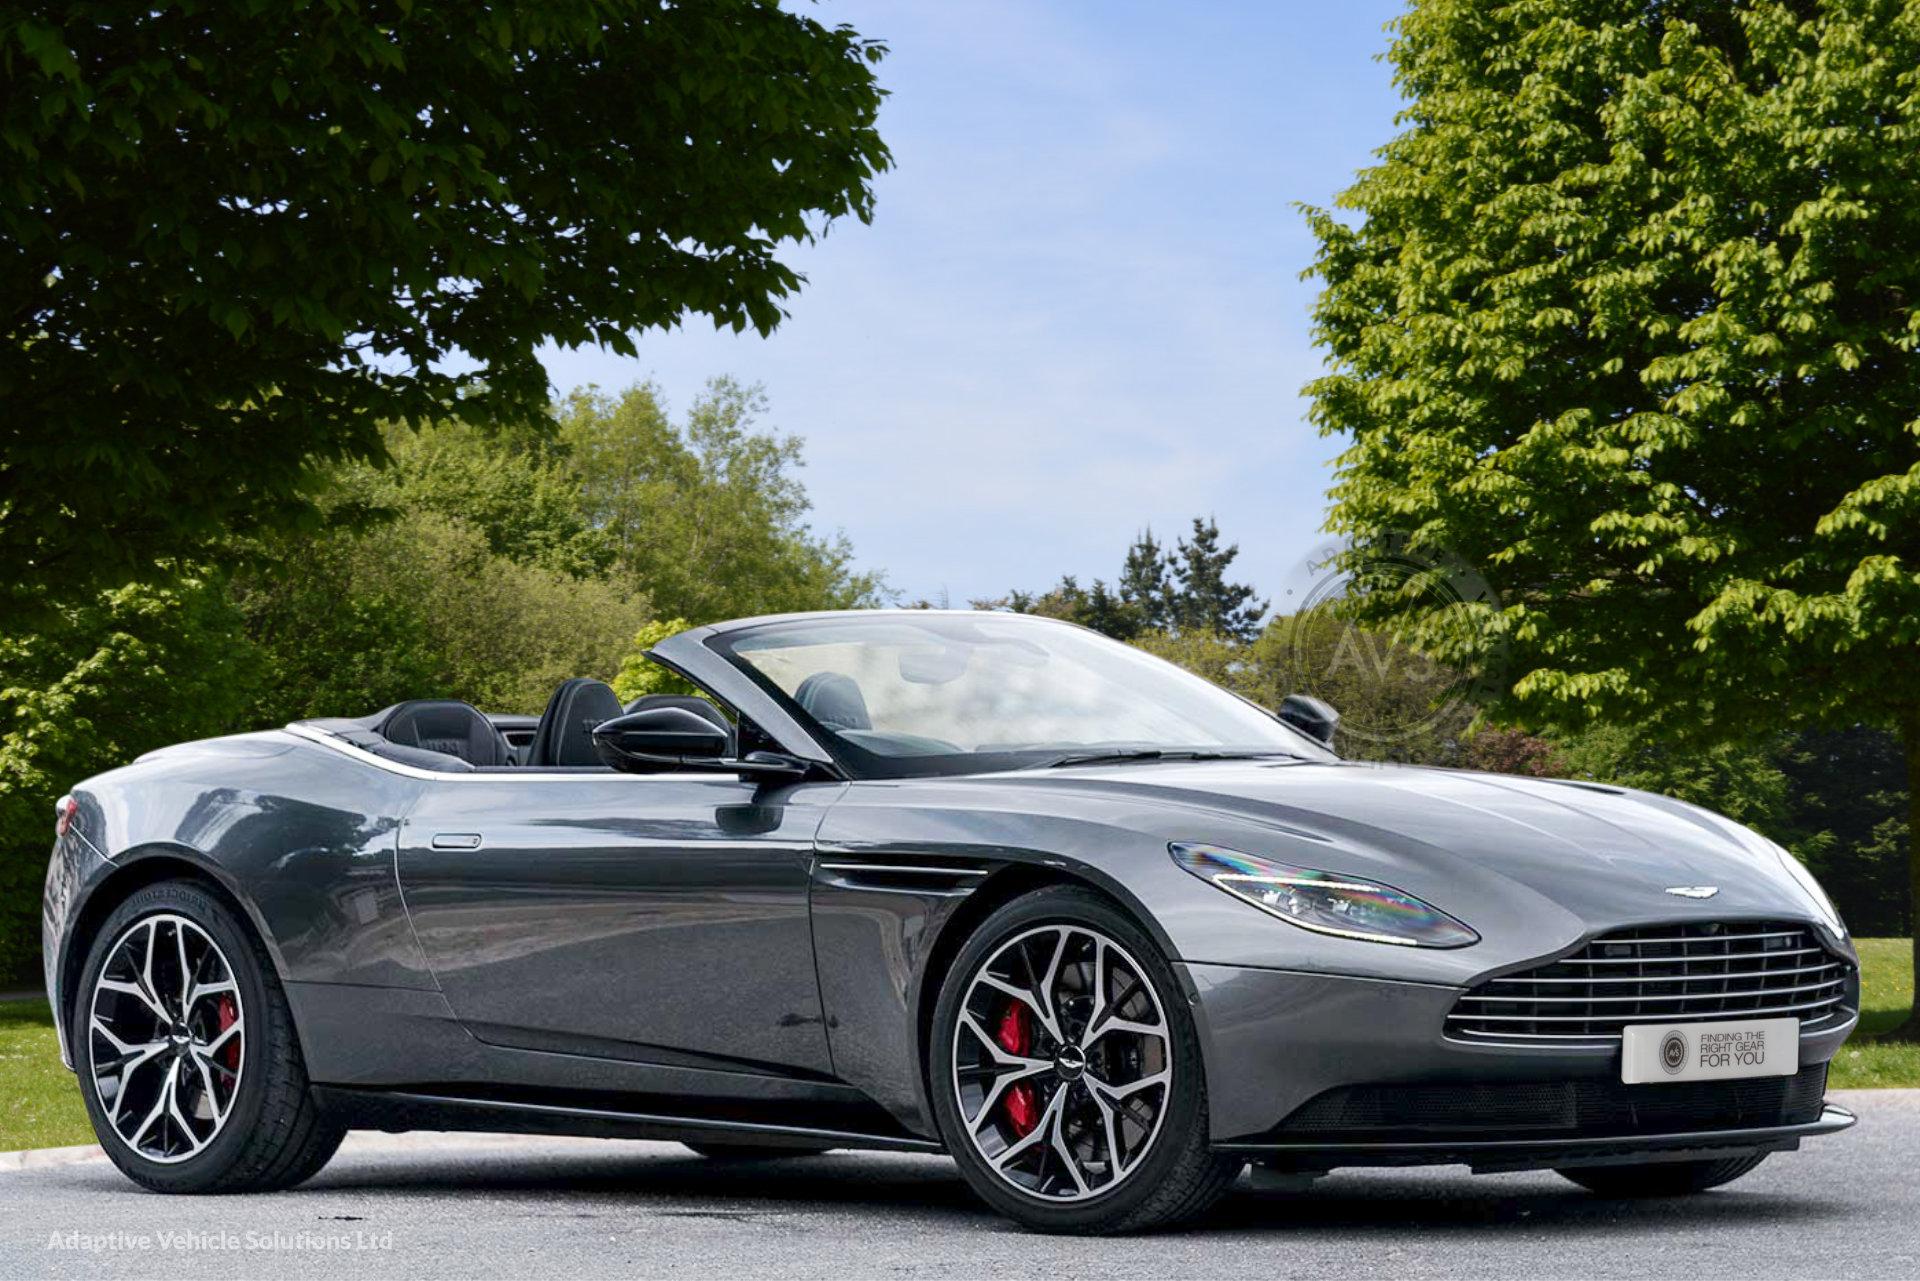 2018 Aston Martin Db11 V8 Volante Adaptive Vehicle Solutions Ltd